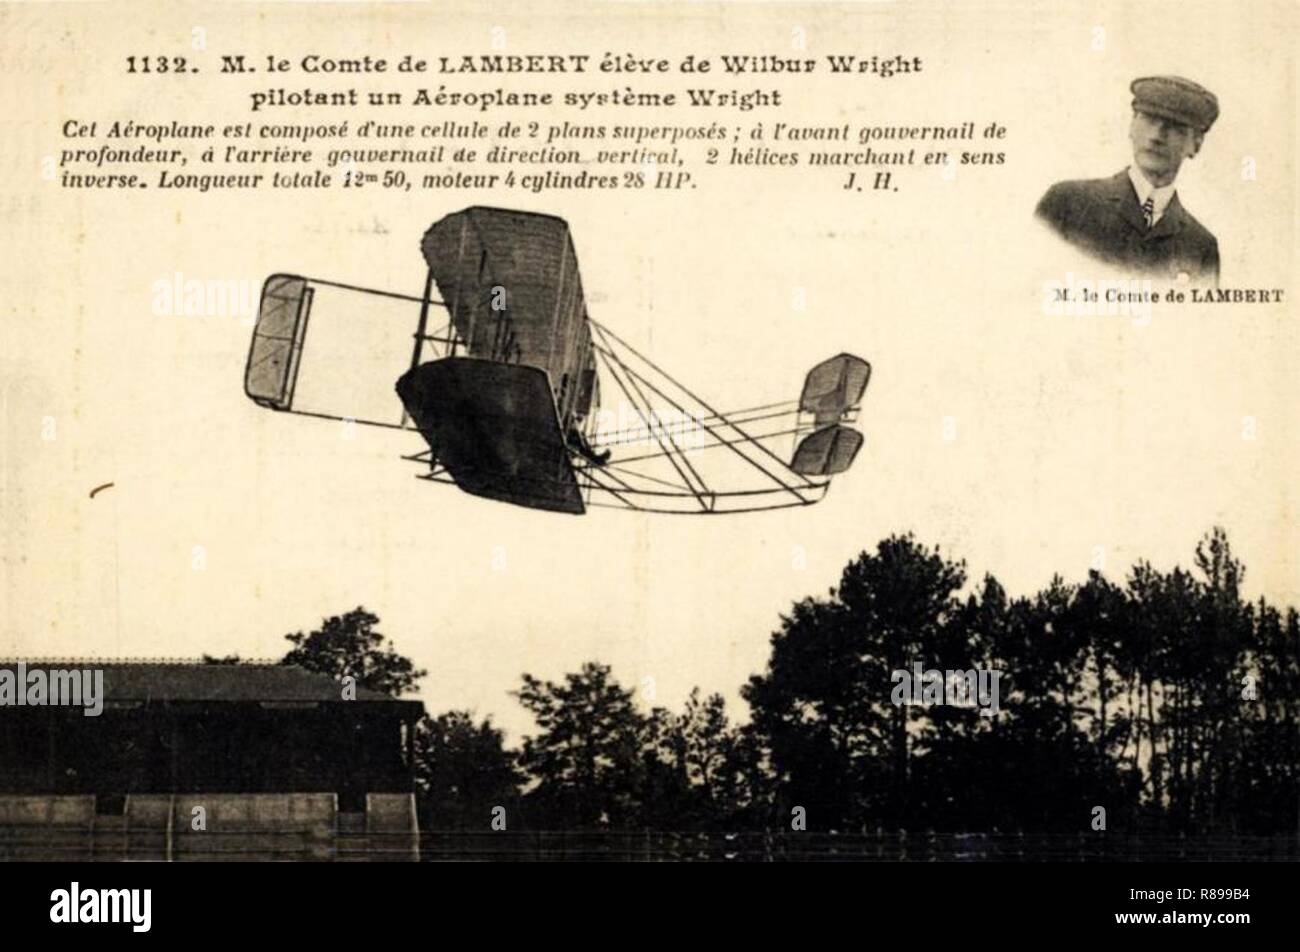 Carlos Alexandre, conde de Lambert pilotando o biplano Wrigth - Pau, 1909 (2). Foto de stock